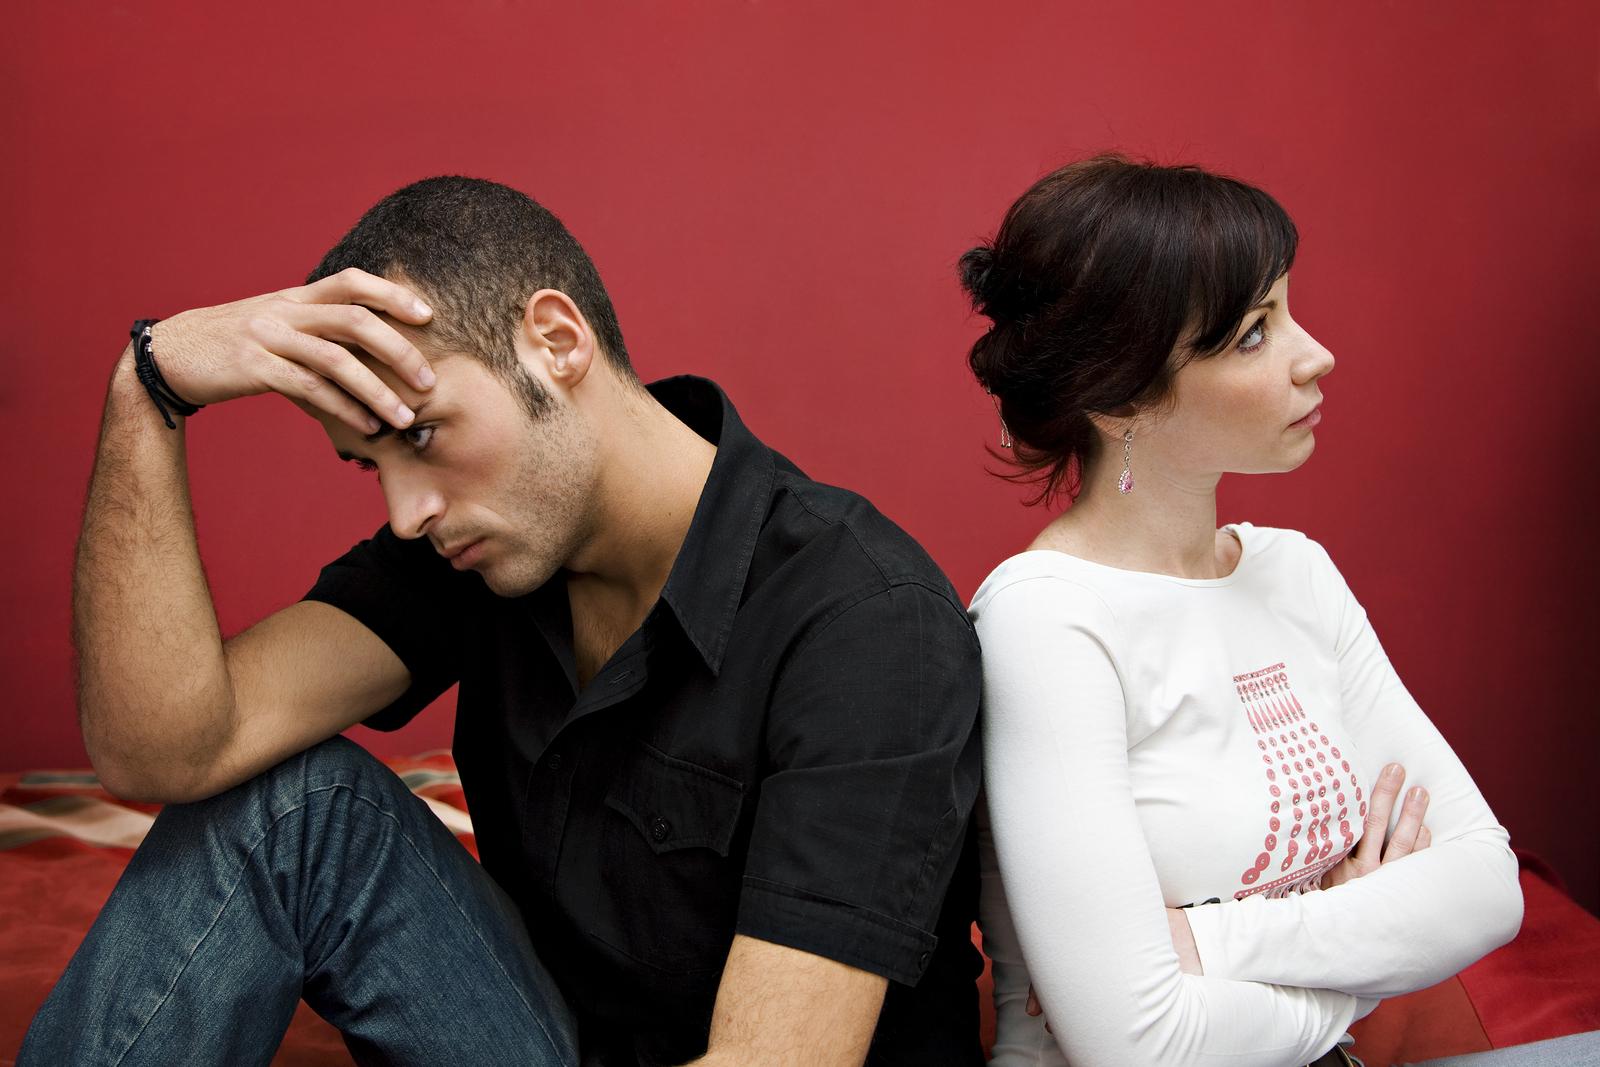 очевидно, развод из-за ревности жены таком